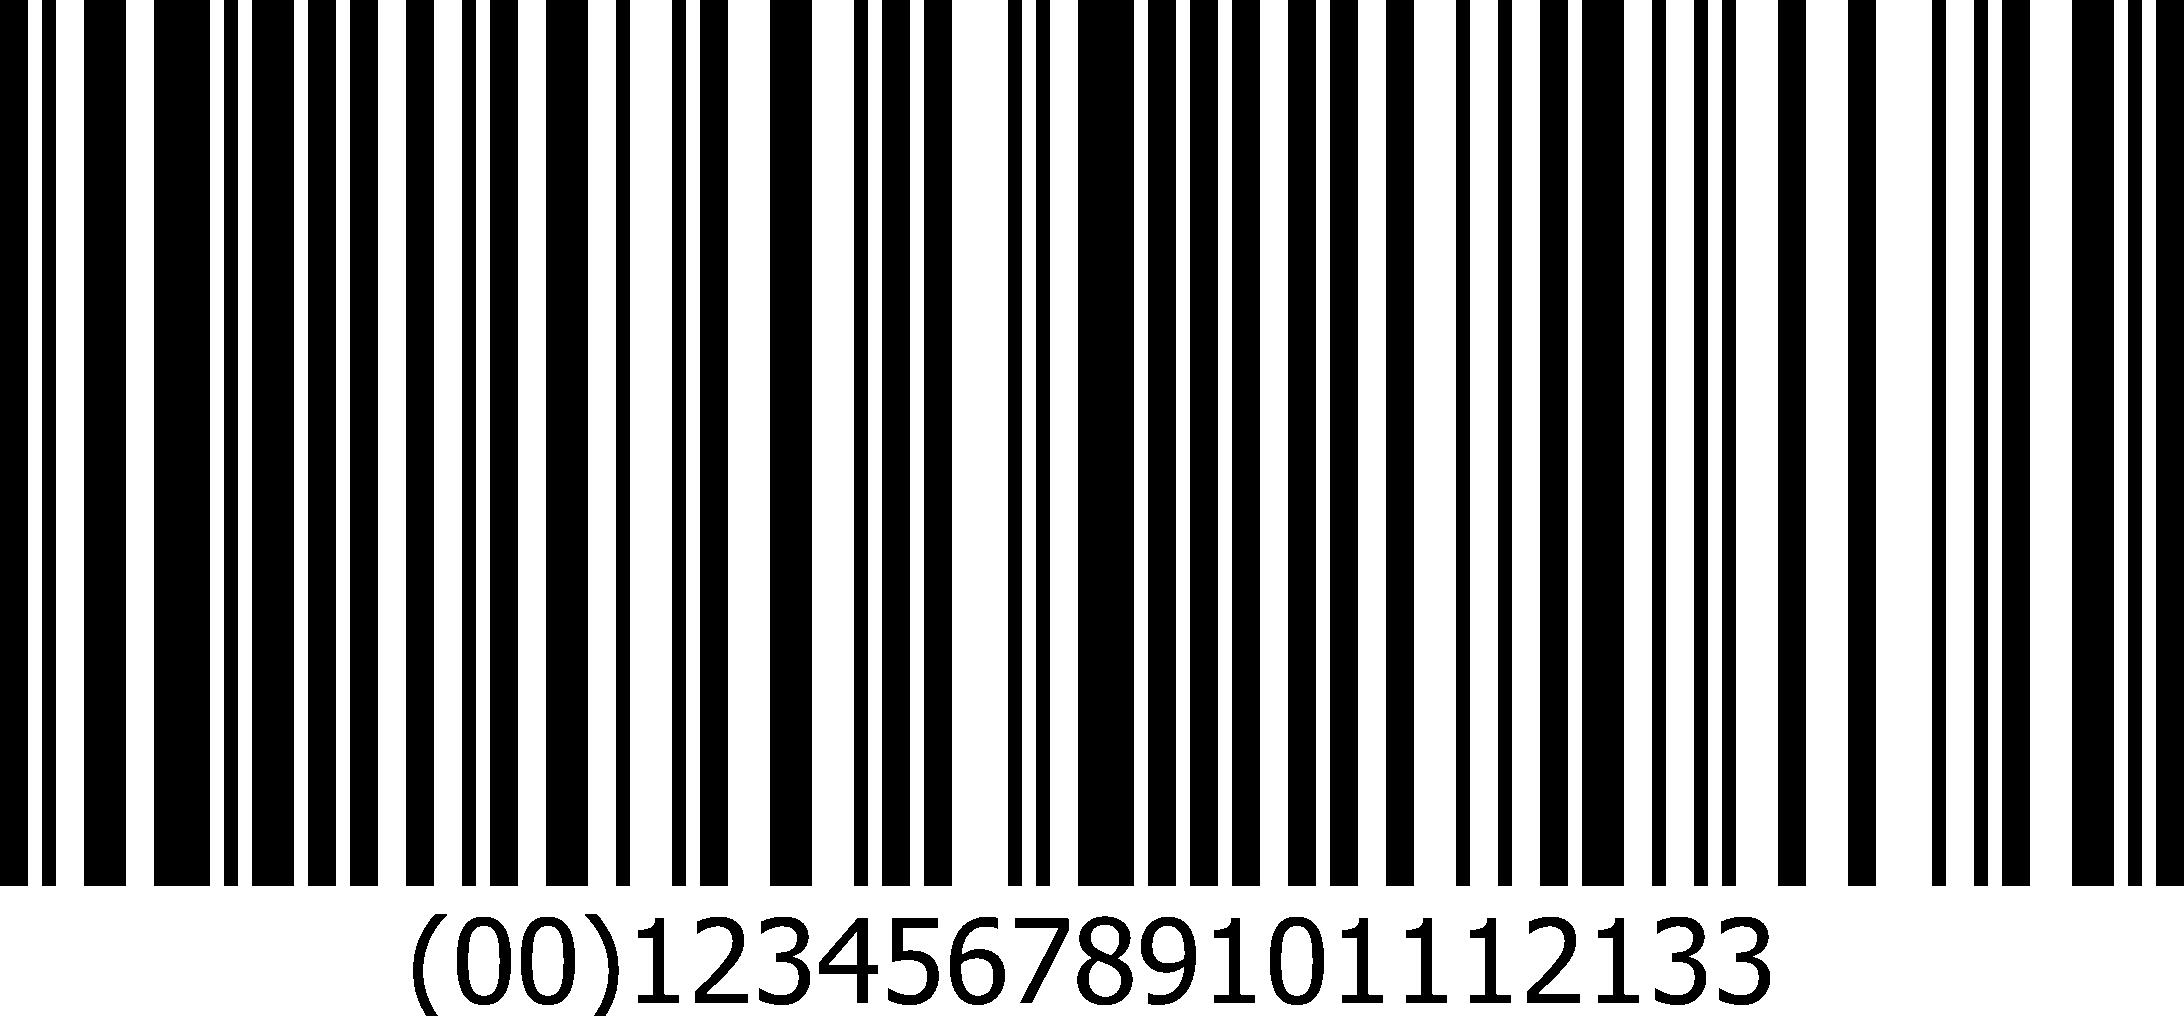 Barcode in Hindi